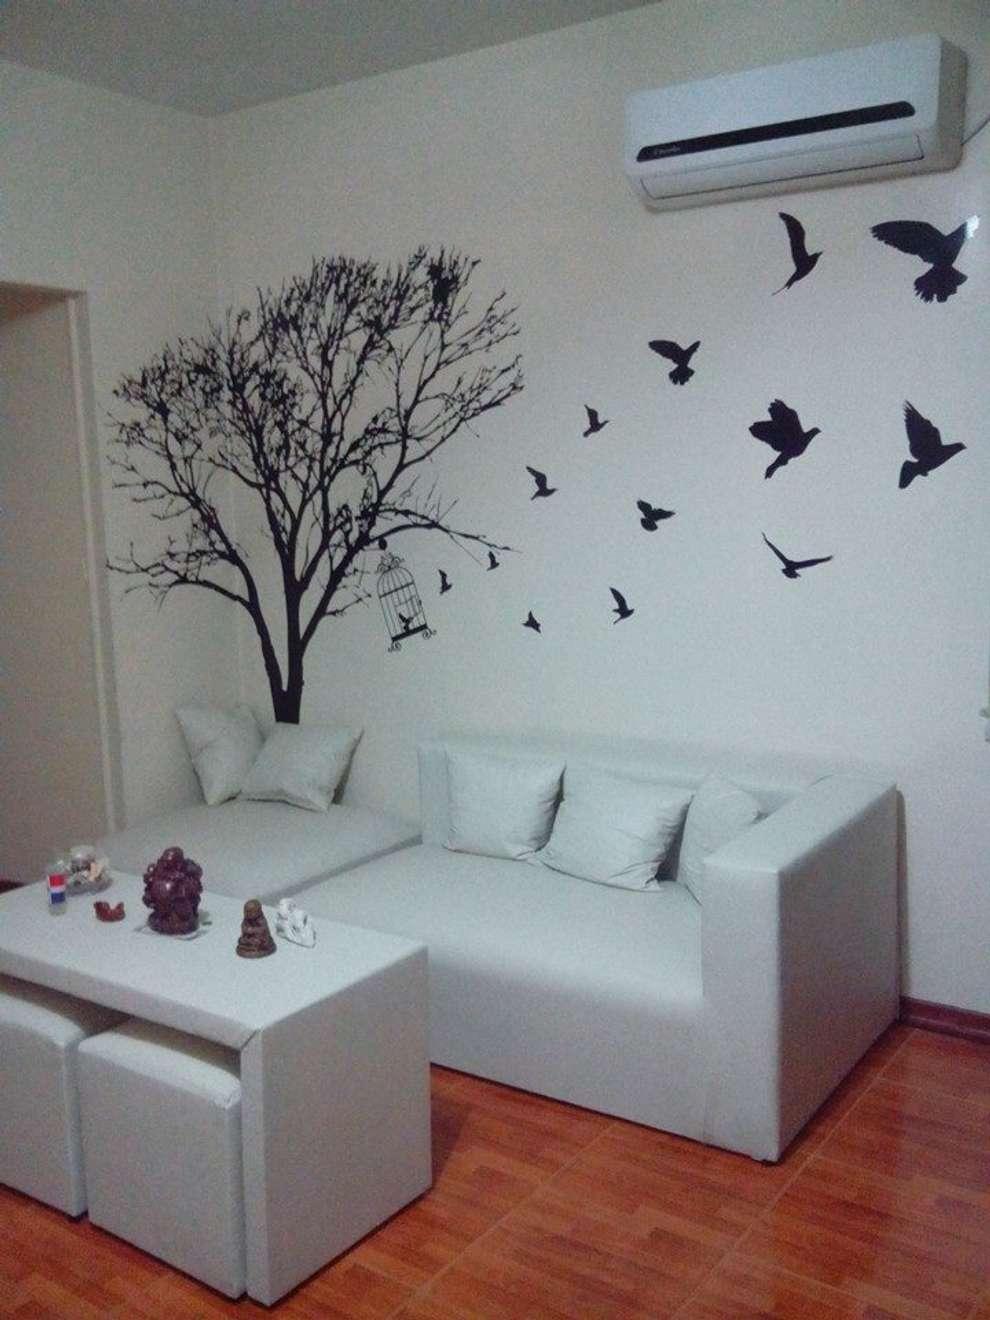 Vinilo Decorativo Arbol Naturaleza: Livings de estilo moderno por Vinilos Impacto Creativo